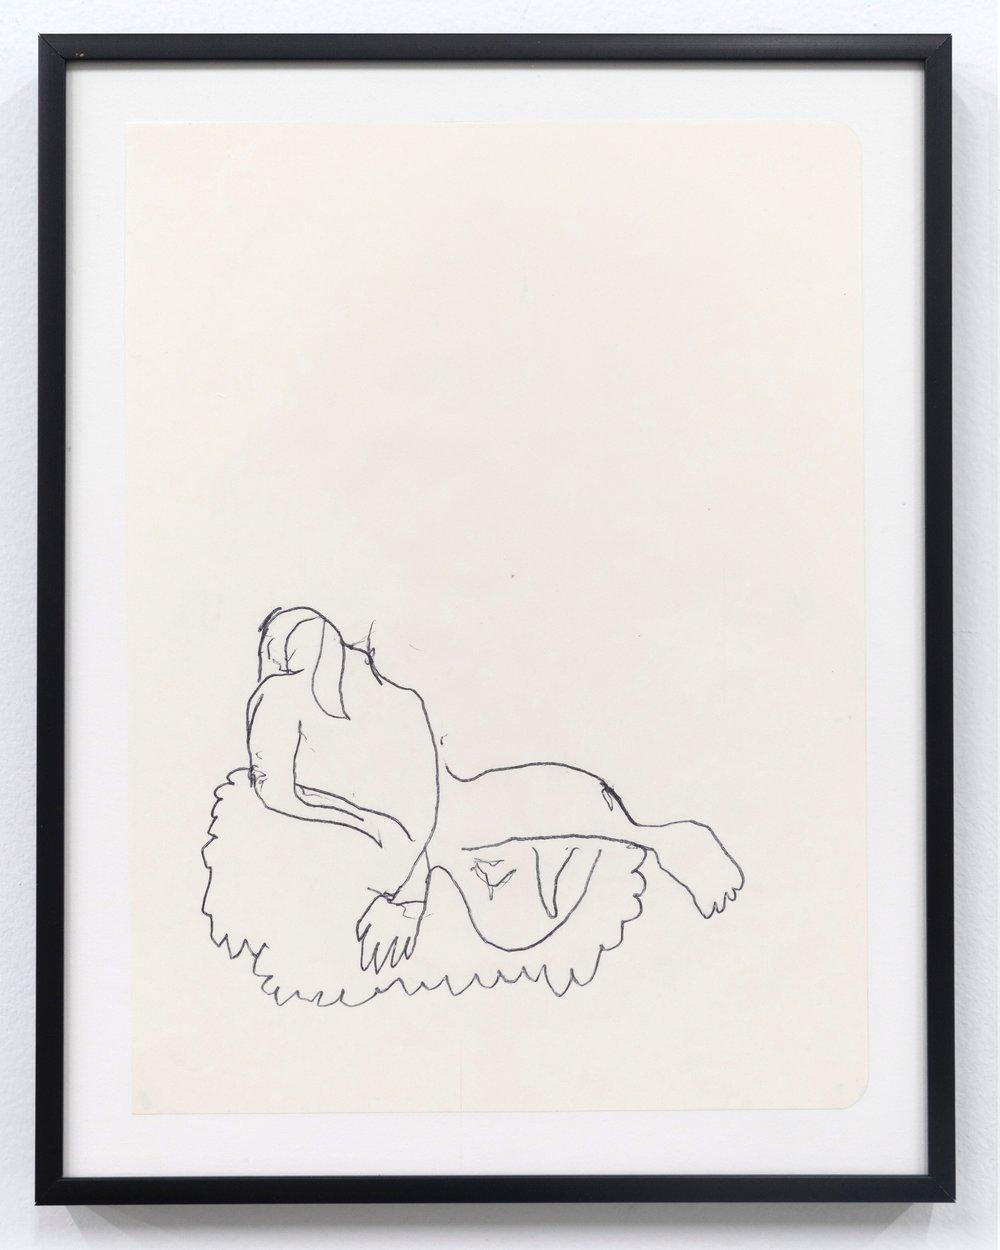 Emilie Gossiaux    Venus , 2018 Ink on newsprint   11 1/2 x 9 1/8 inches 29.2 x 23.2 cm